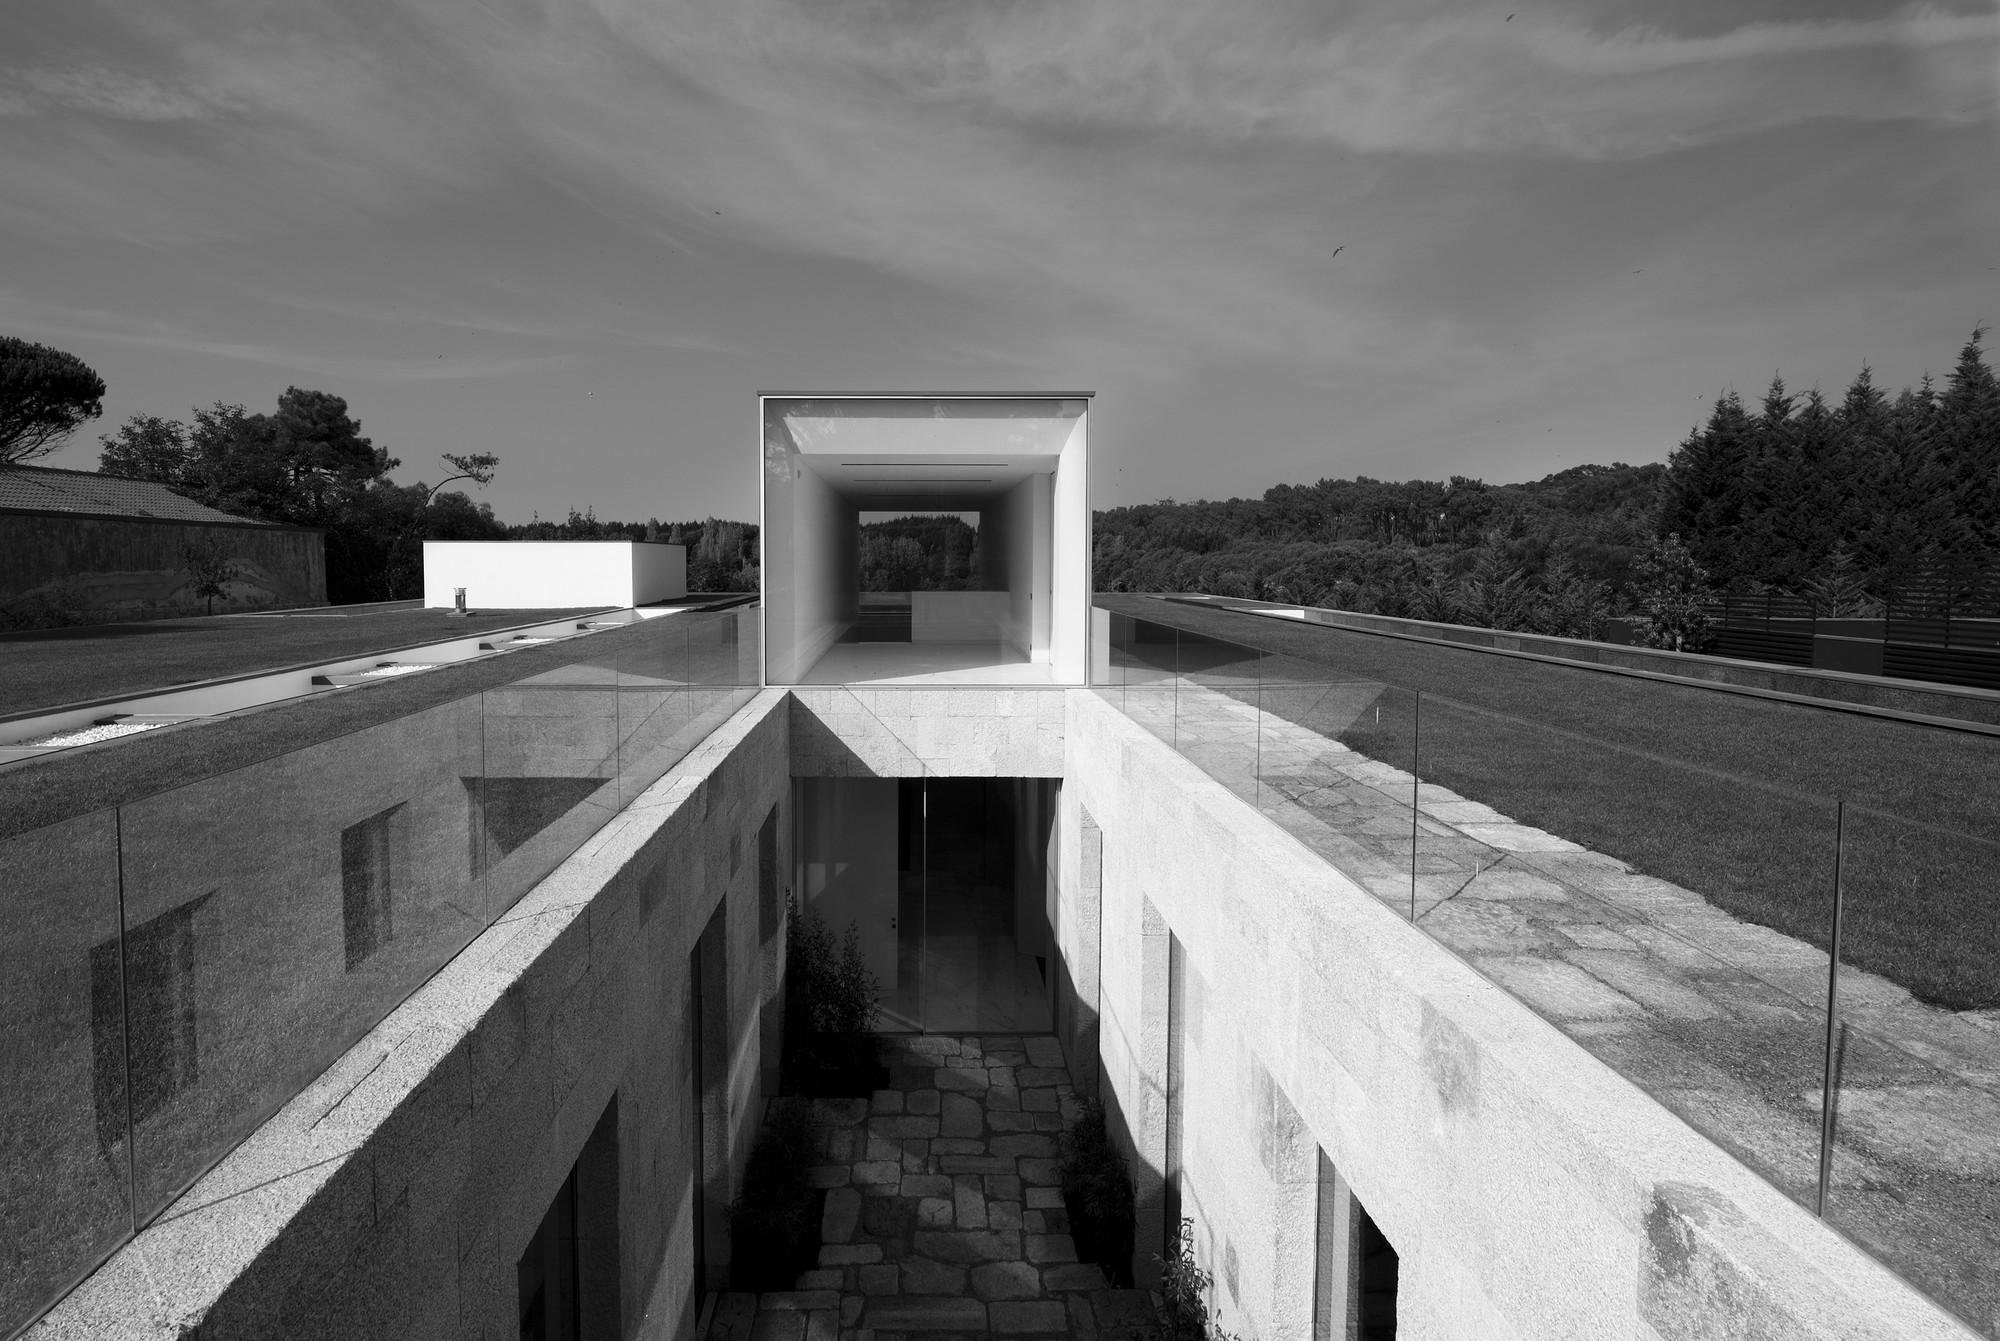 Casa en Boavista / Frederico Valsassina Arquitectos, © Juan Rodríguez